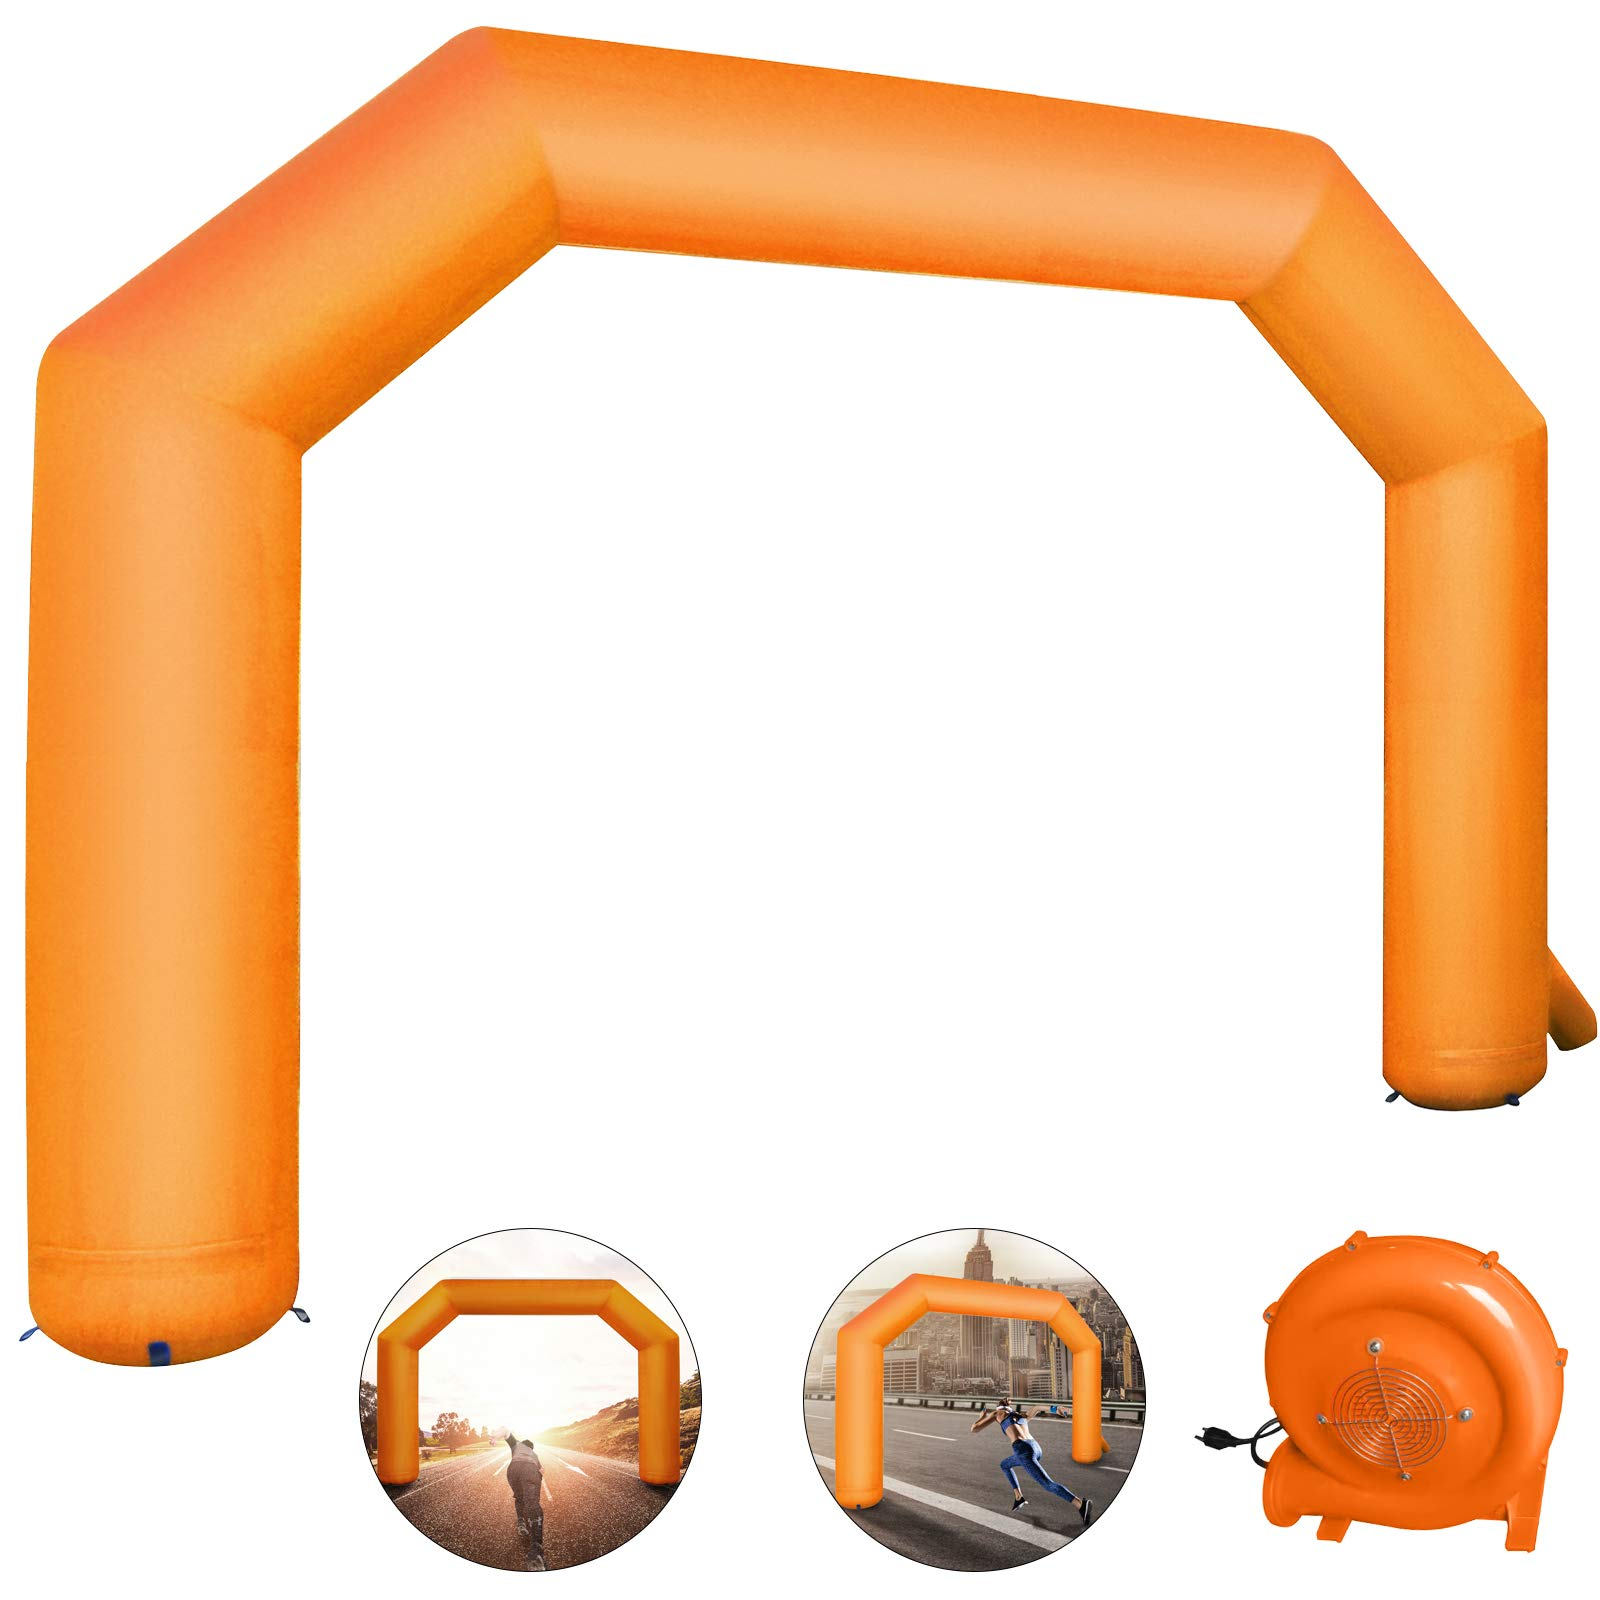 Happybuy Inflatable Arch Orange 20ft Hexagon Inflatable Arch with Blower Inflatable Archway for Race Outdoor Advertising Commerce